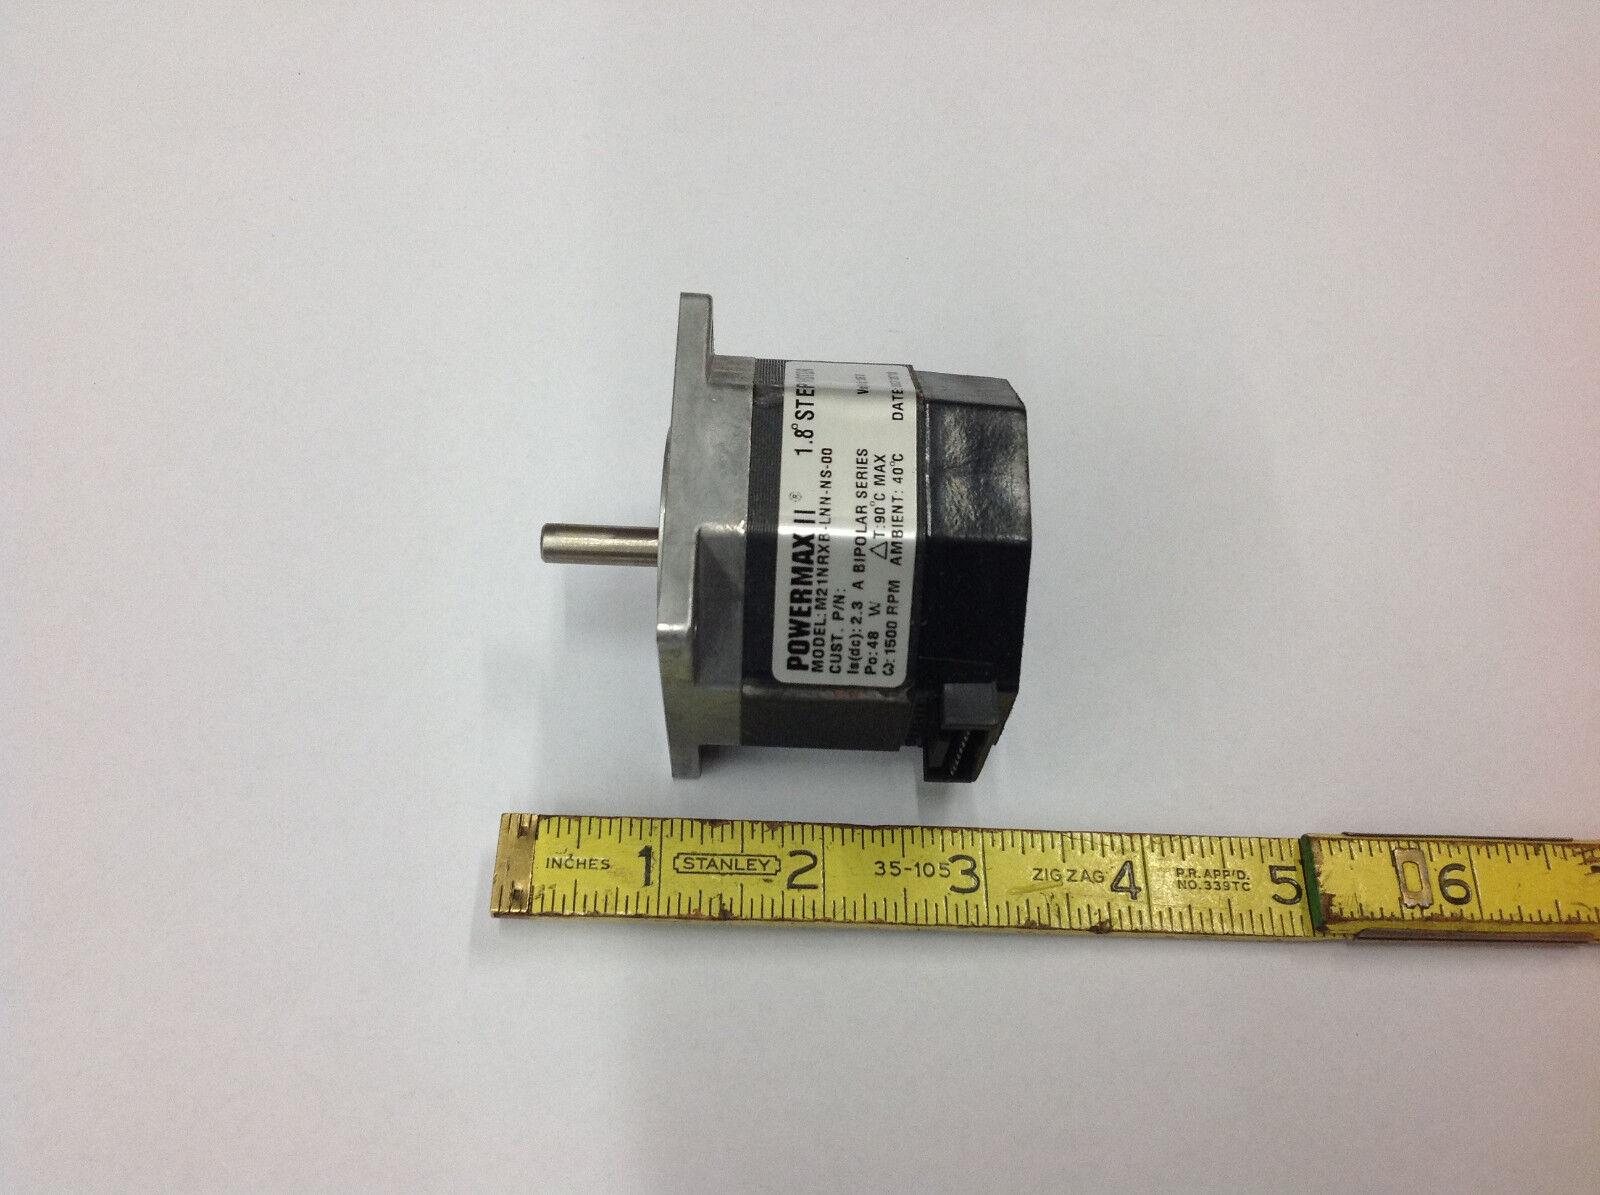 # M21NRXB-LDN-NS-00 1500 RPM New Pacific Scientific Powermax II 1.8 step motor